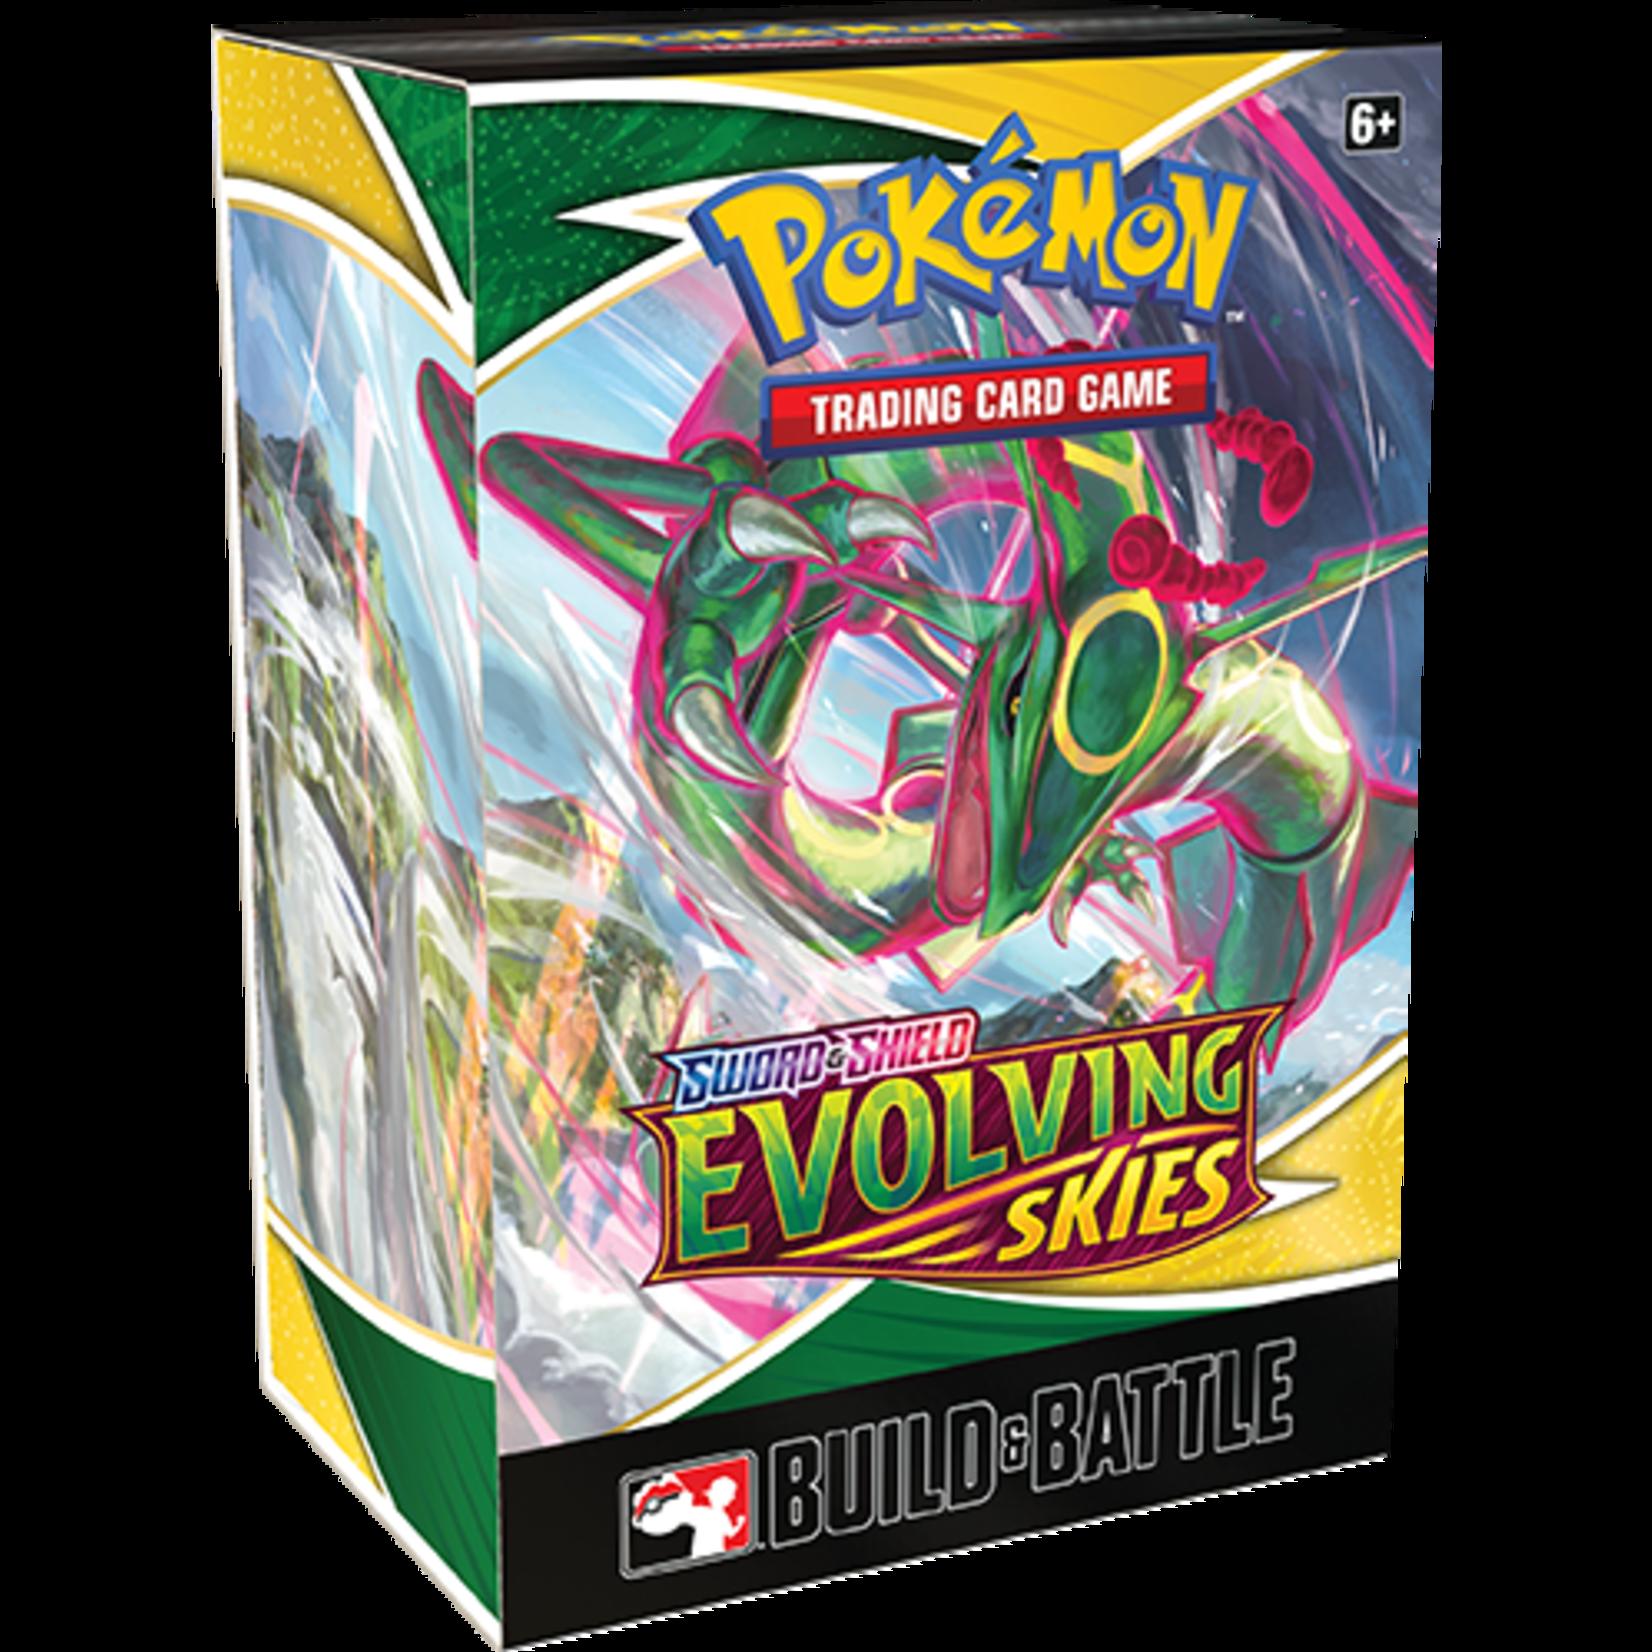 Pokémon Pokémon TCG: Sword & Shield—Evolving Skies Build & Battle Box